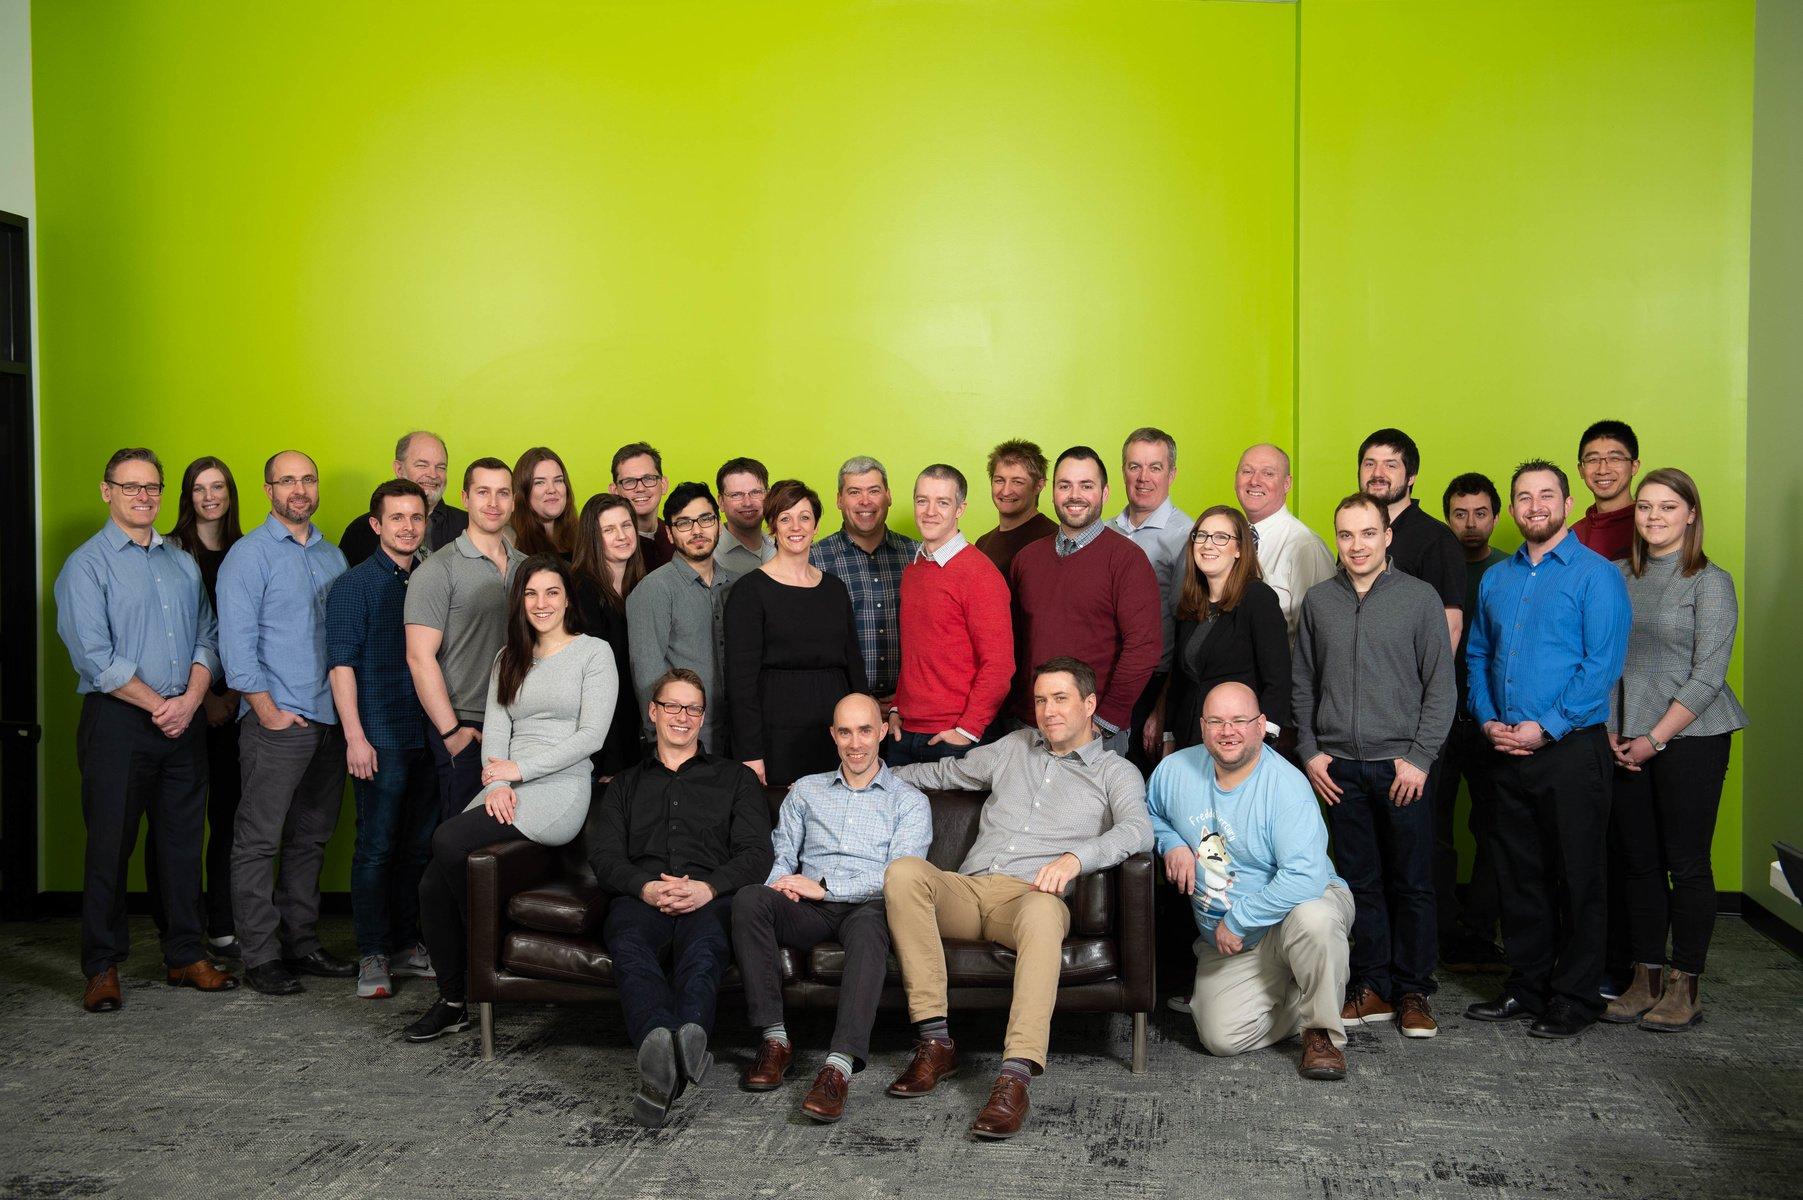 Crank Software's employee group photo